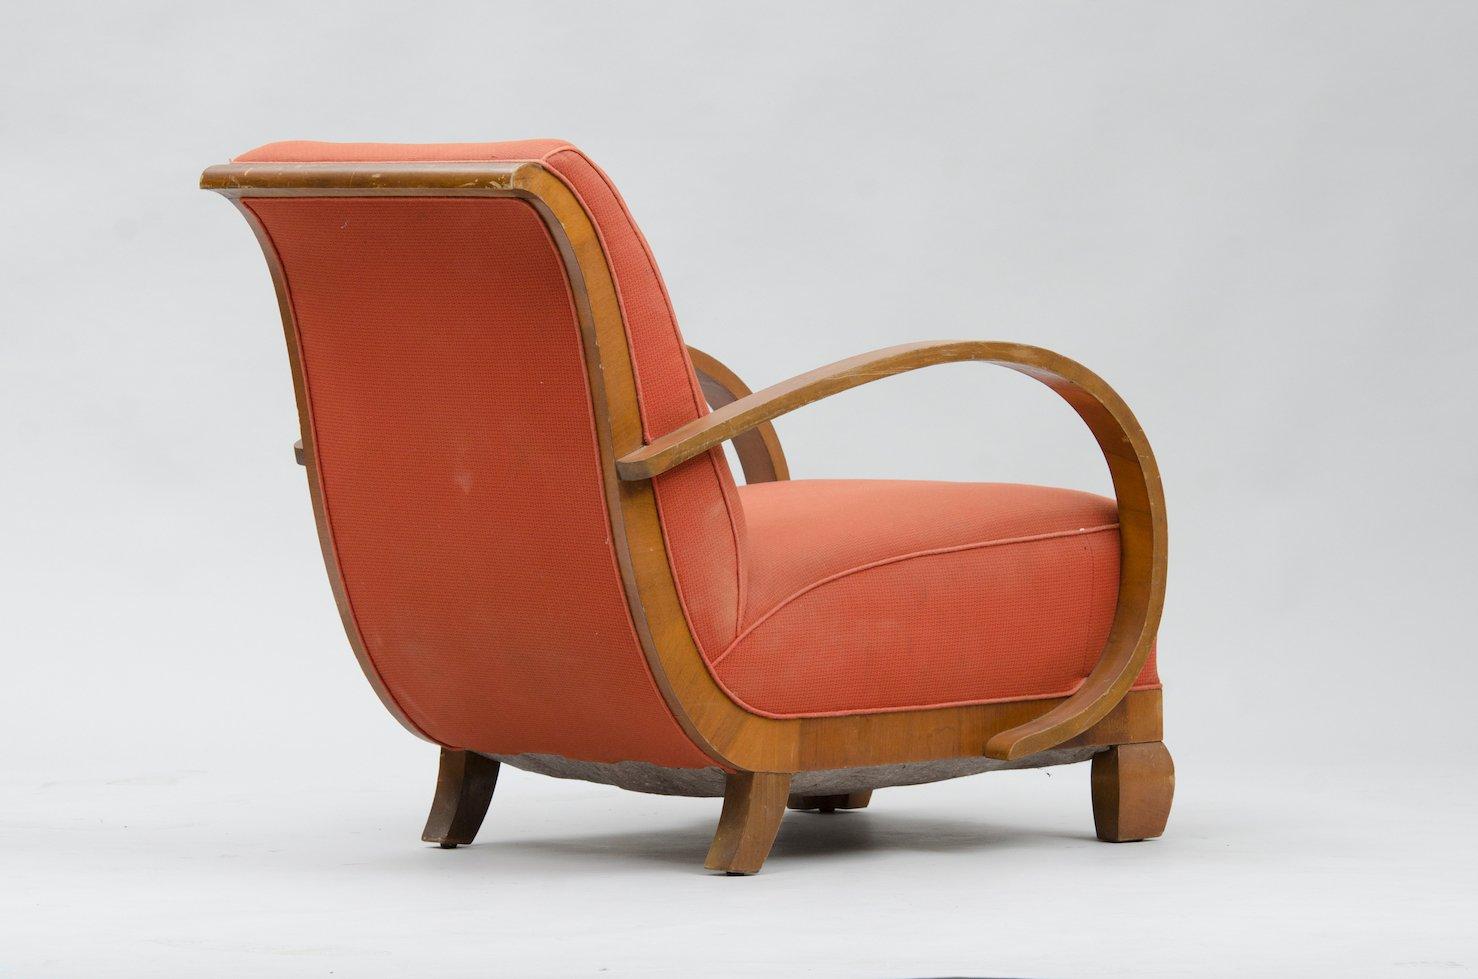 Ordinaire Art Deco Armchair In Walnut 7. $1,385.00. Price Per Piece